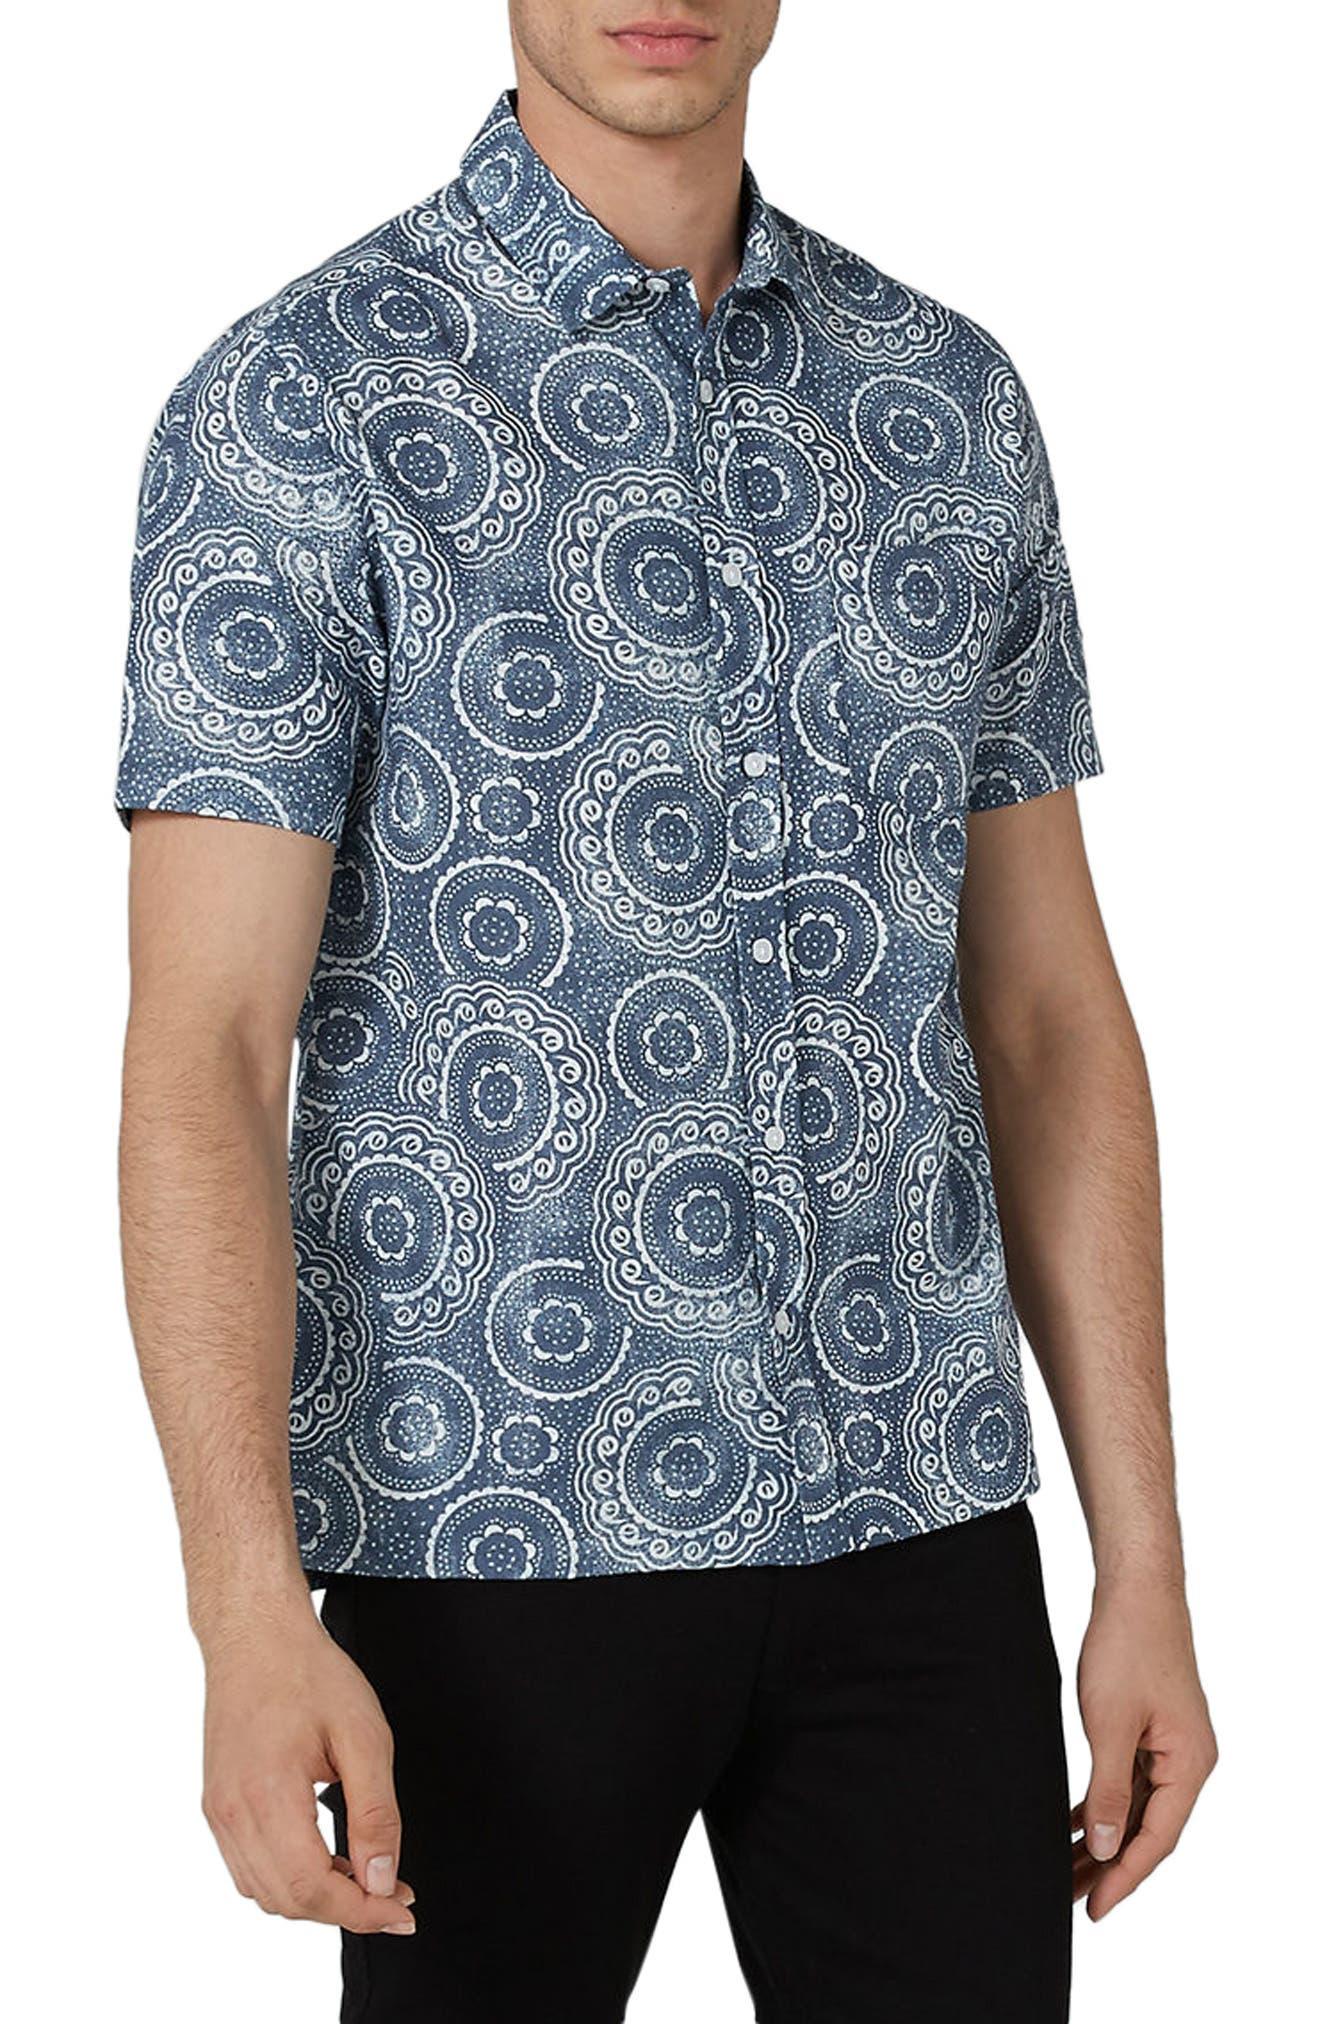 Main Image - Topman Trim Fit Circle Print Woven Shirt